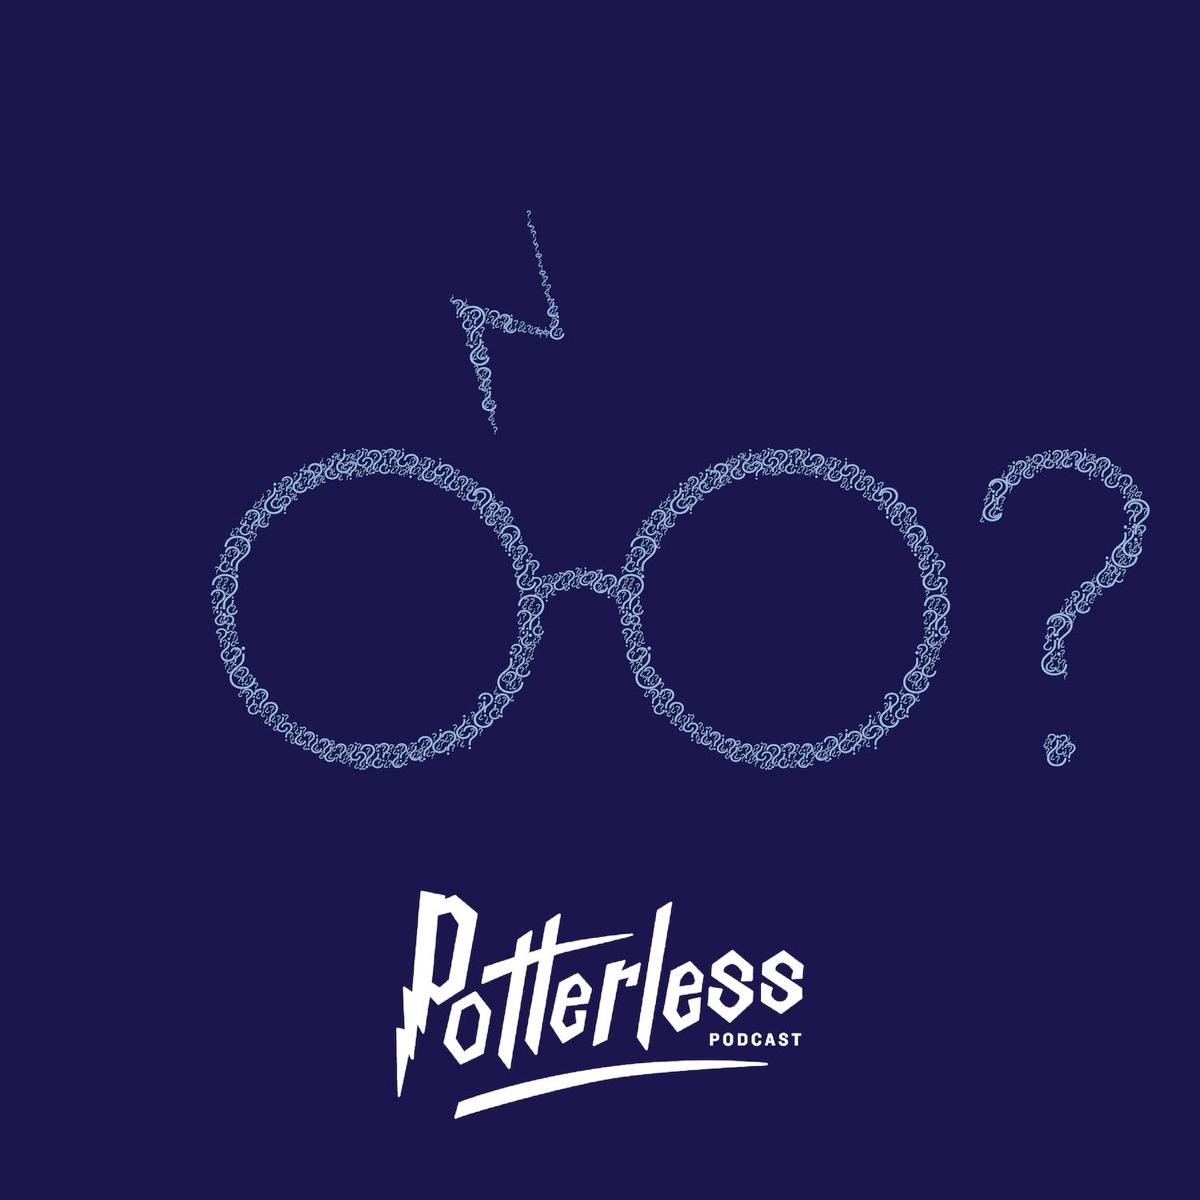 Potterless